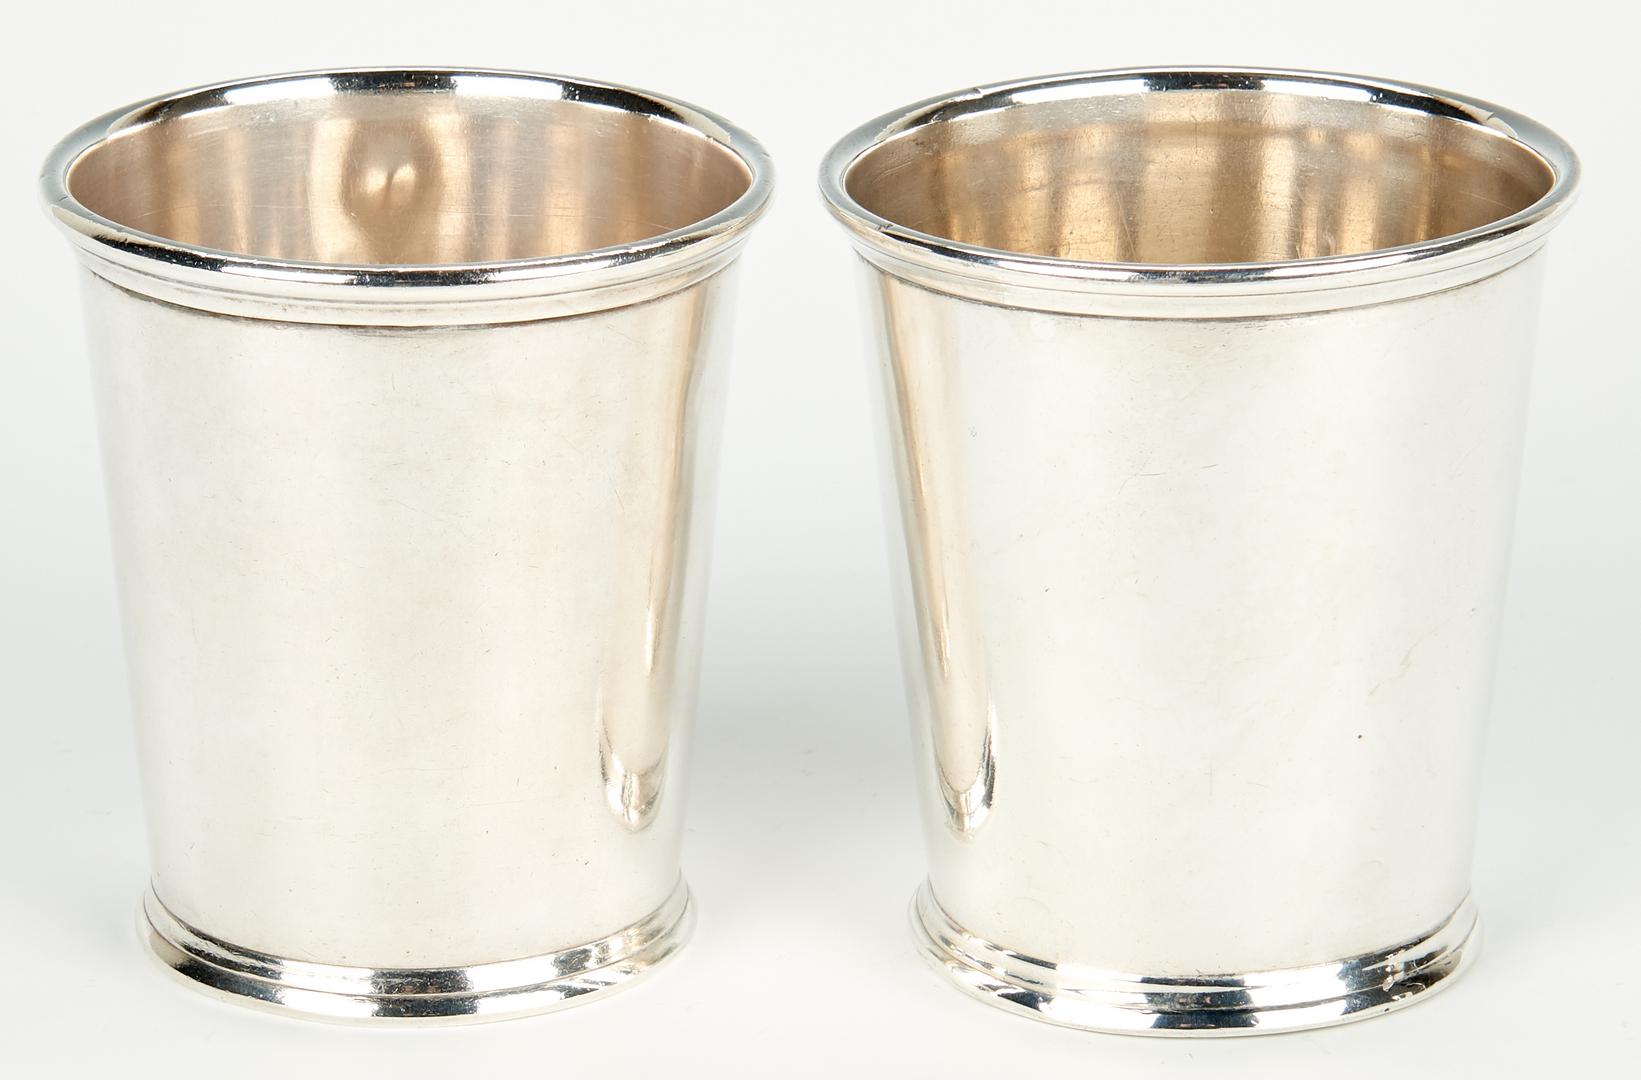 Lot 59: 4 Kentucky Akin Retailed Coin Silver Julep Cups